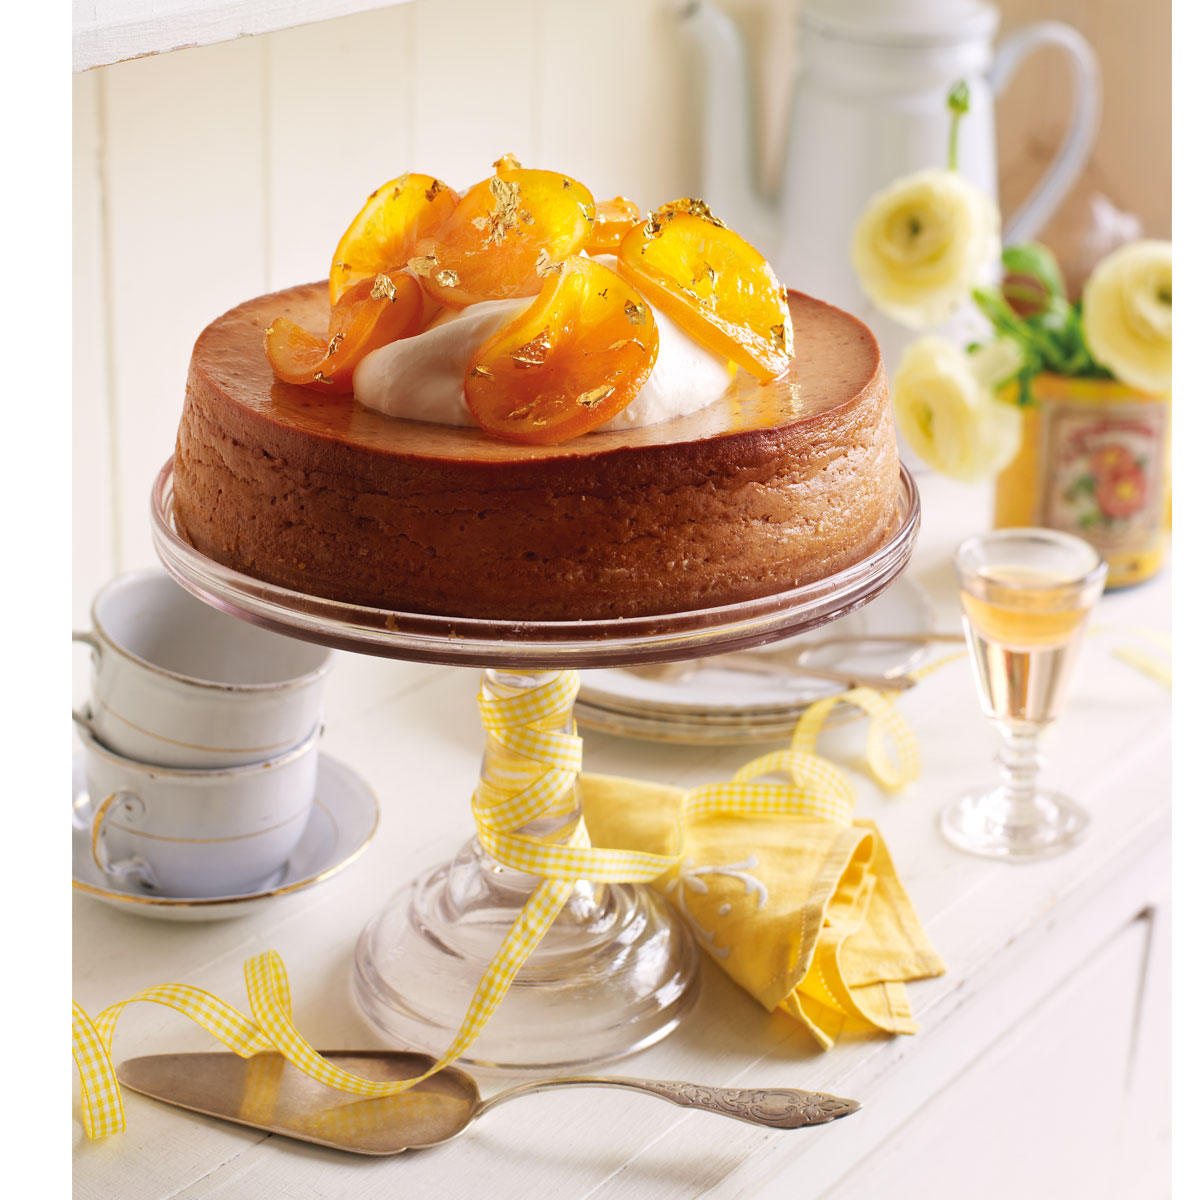 Easter cheesecake - Good Housekeeping